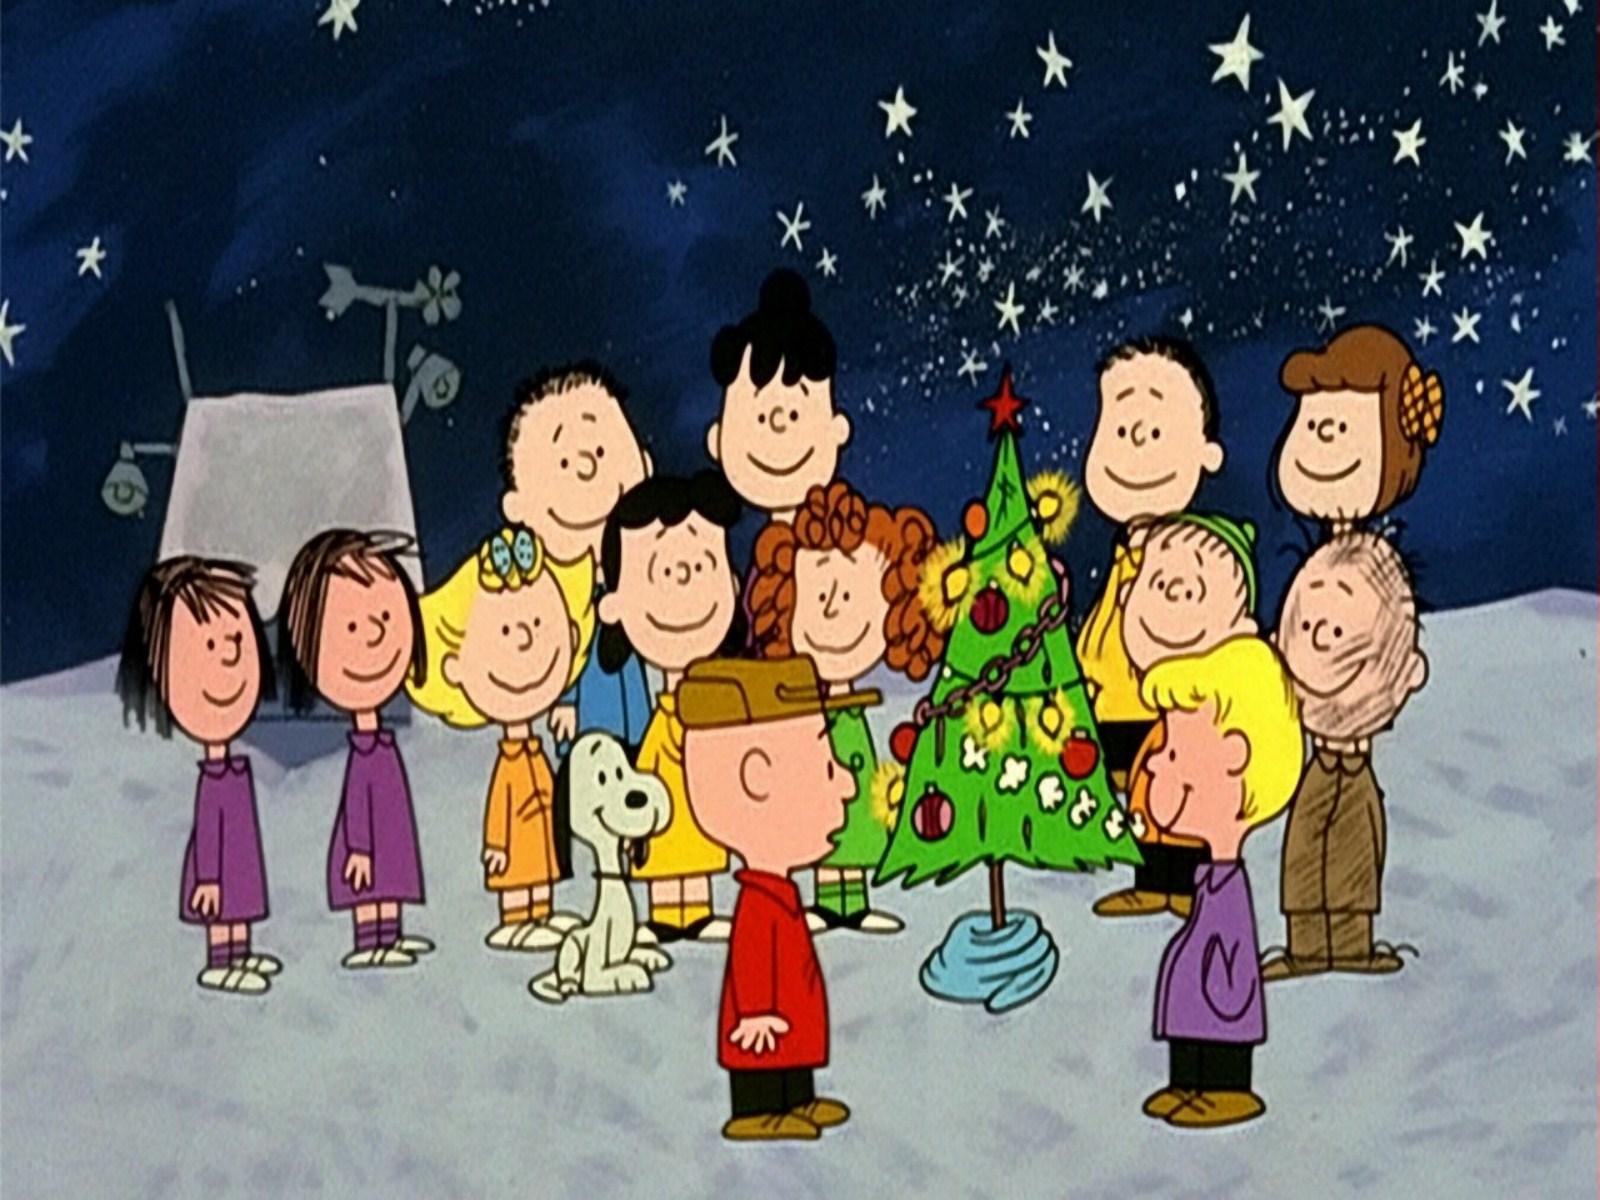 Charlie Brown Christmas Wallpaper   1600x1200   331520 1600x1200